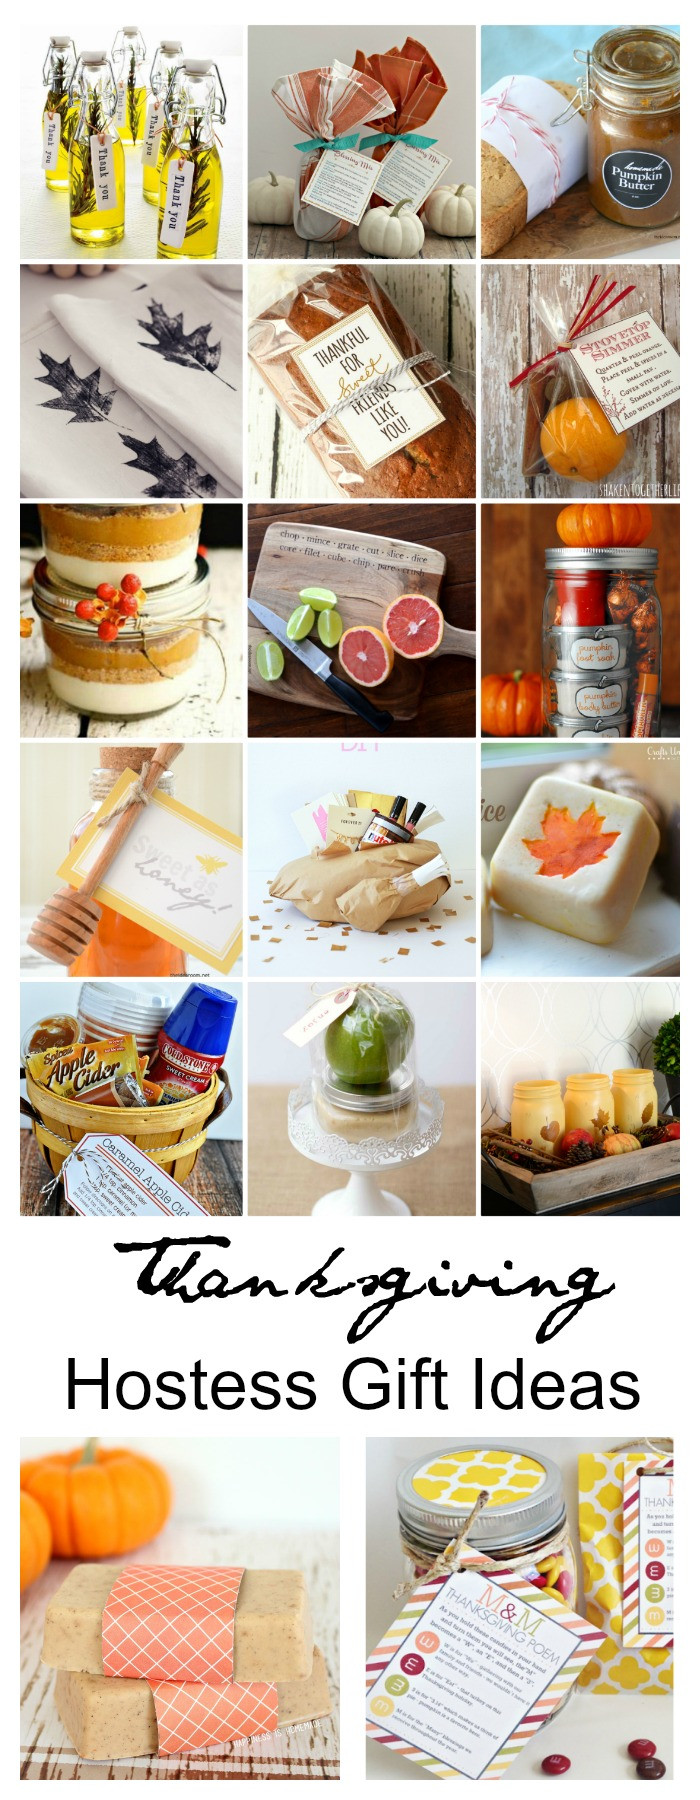 Thanksgiving Hostess Gift Ideas  Thanksgiving Hostess Gift Ideas The Idea Room